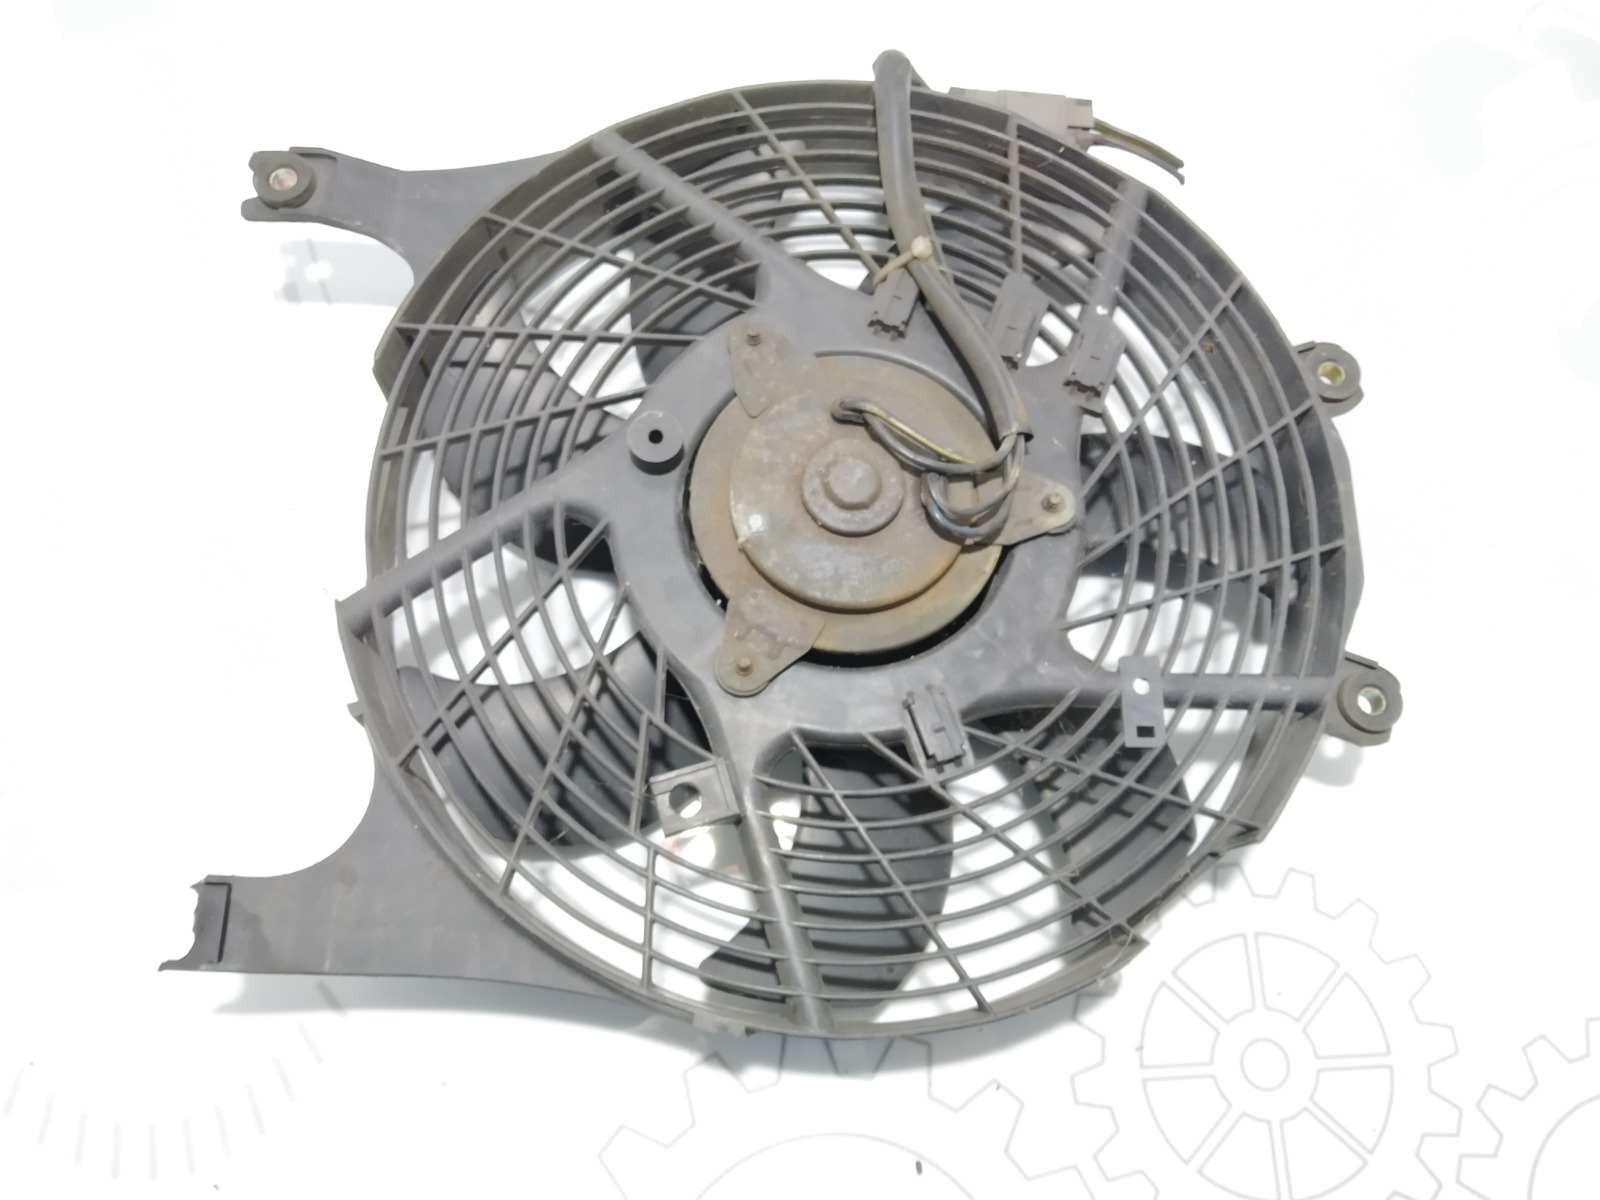 Вентилятор радиатора Mitsubishi Space Star 1.9 DID 2004 (б/у)